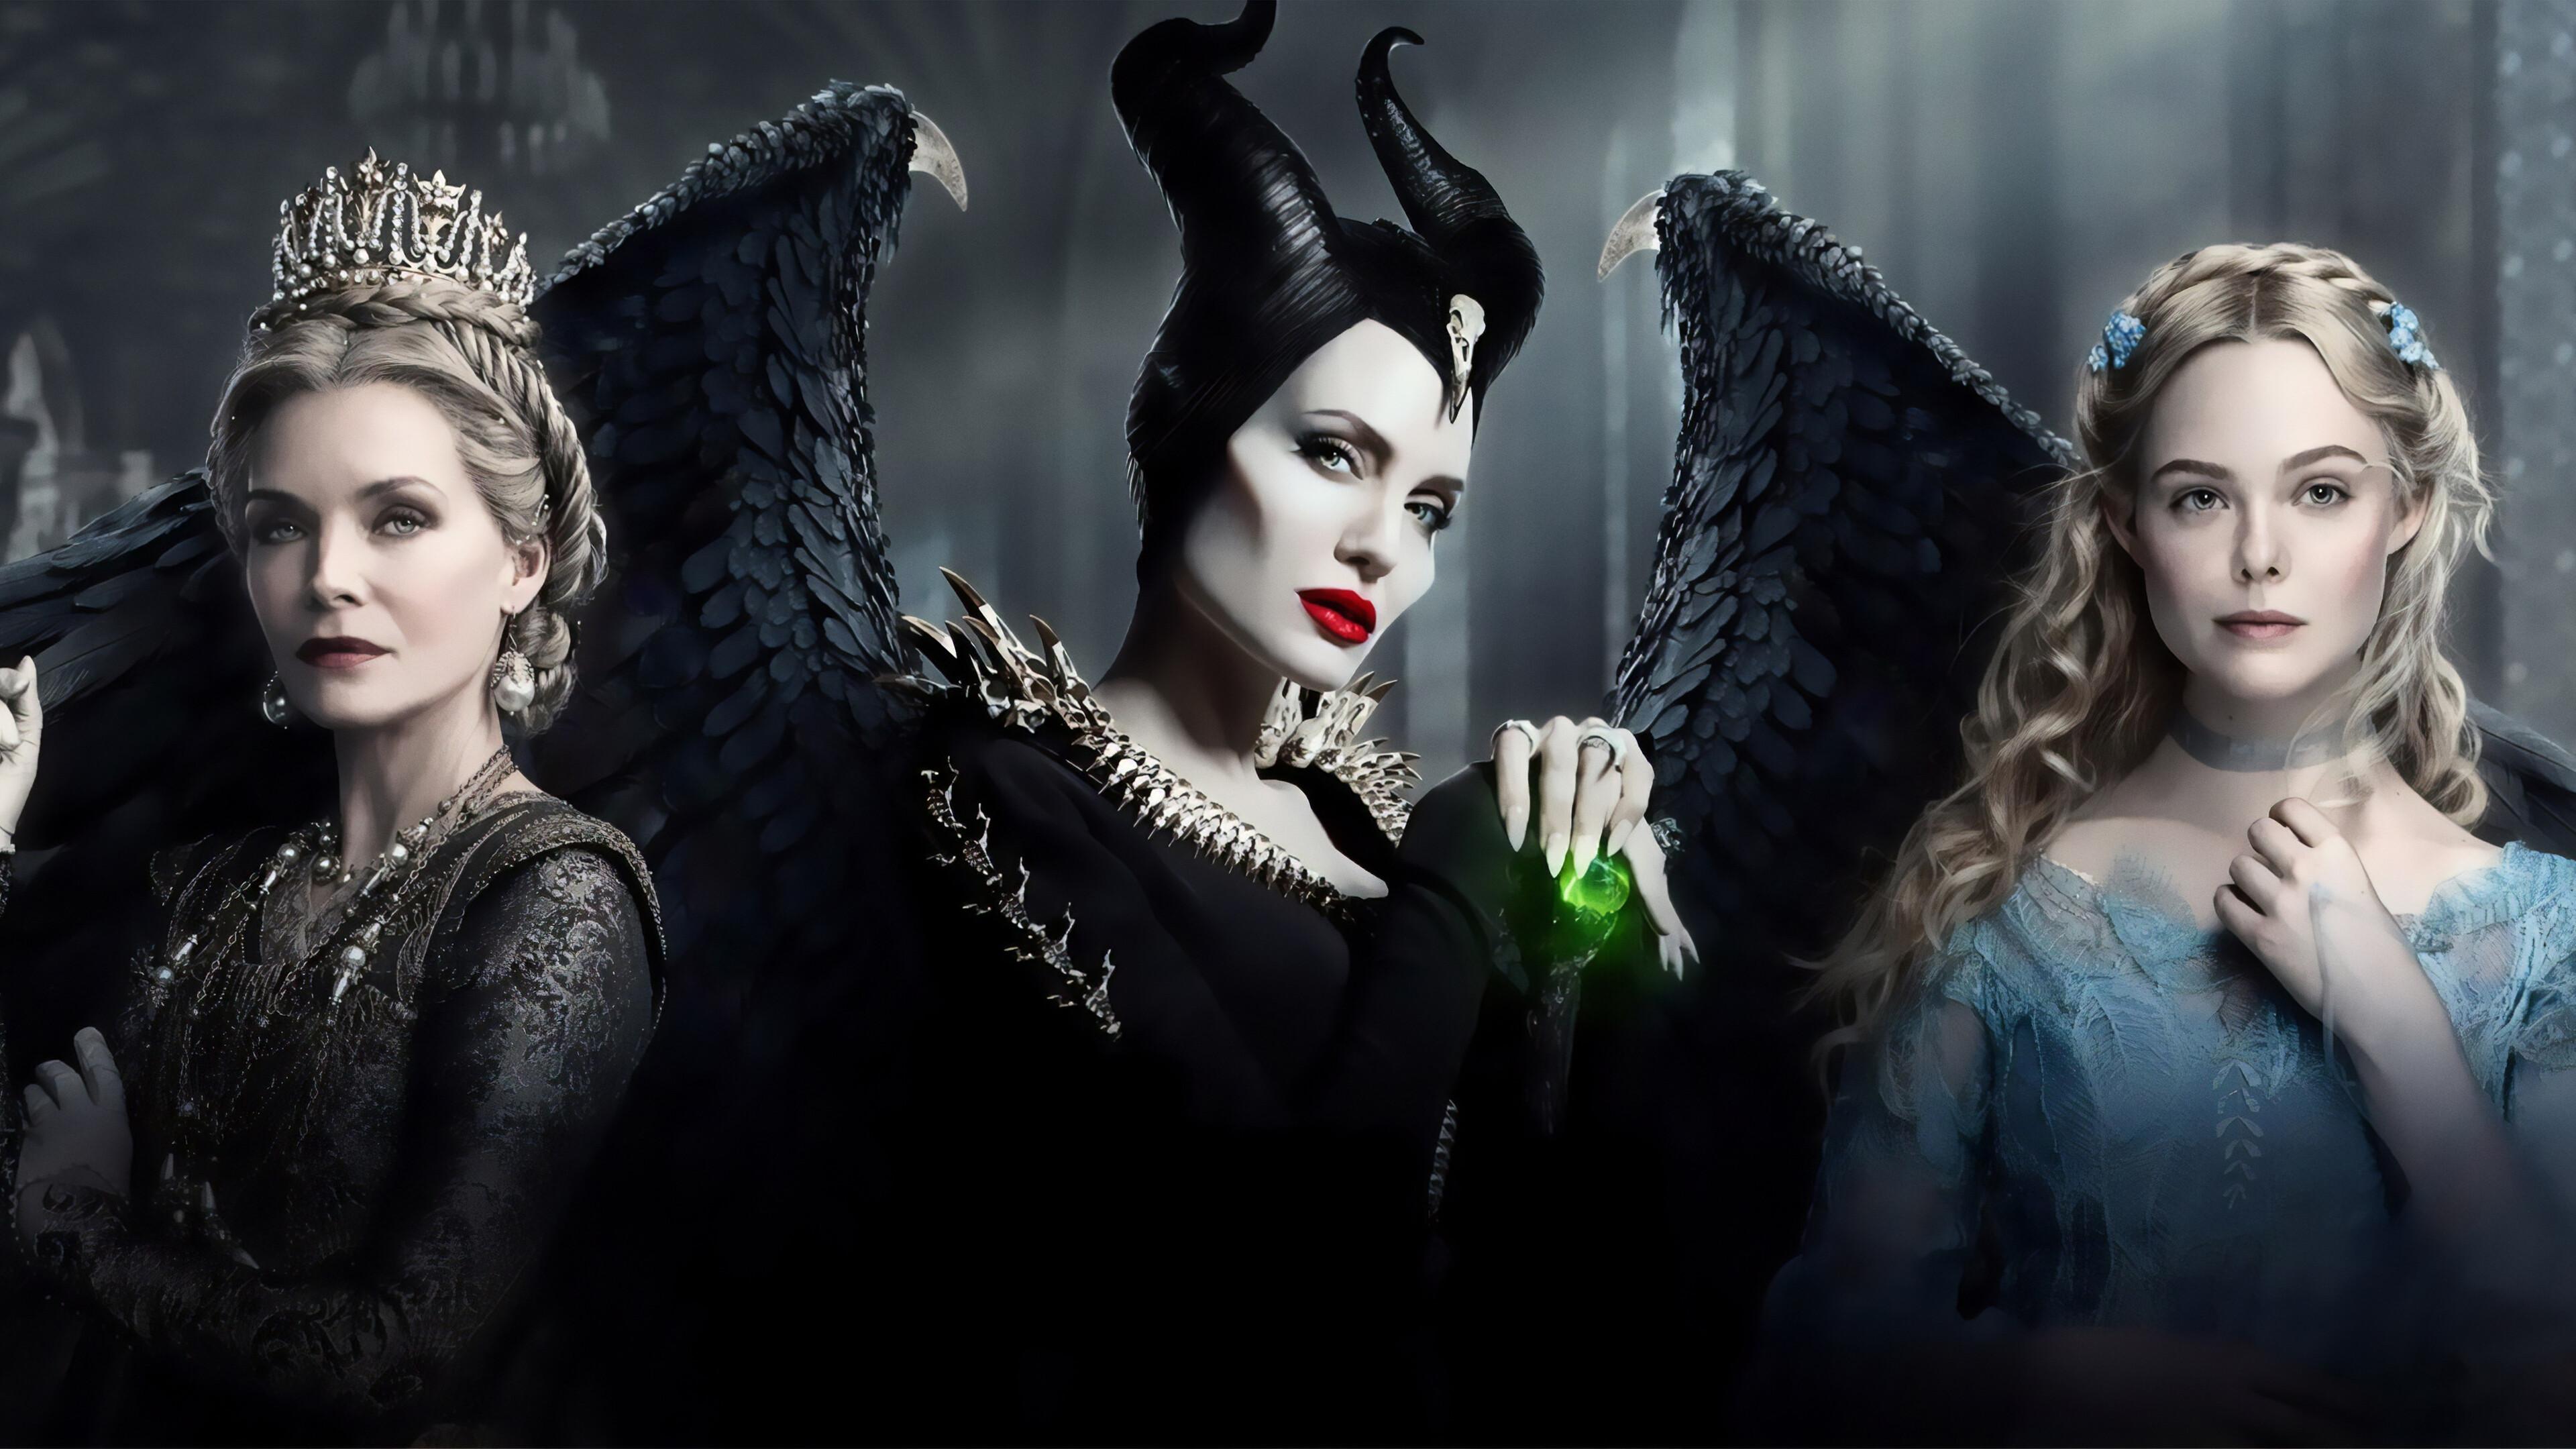 maleficent mistress of evil 2019 1570395298 - Maleficent Mistress Of Evil 2019 - movies wallpapers, maleficent wallpapers, maleficent mistress of evil wallpapers, hd-wallpapers, 5k wallpapers, 4k-wallpapers, 2019 movies wallpapers